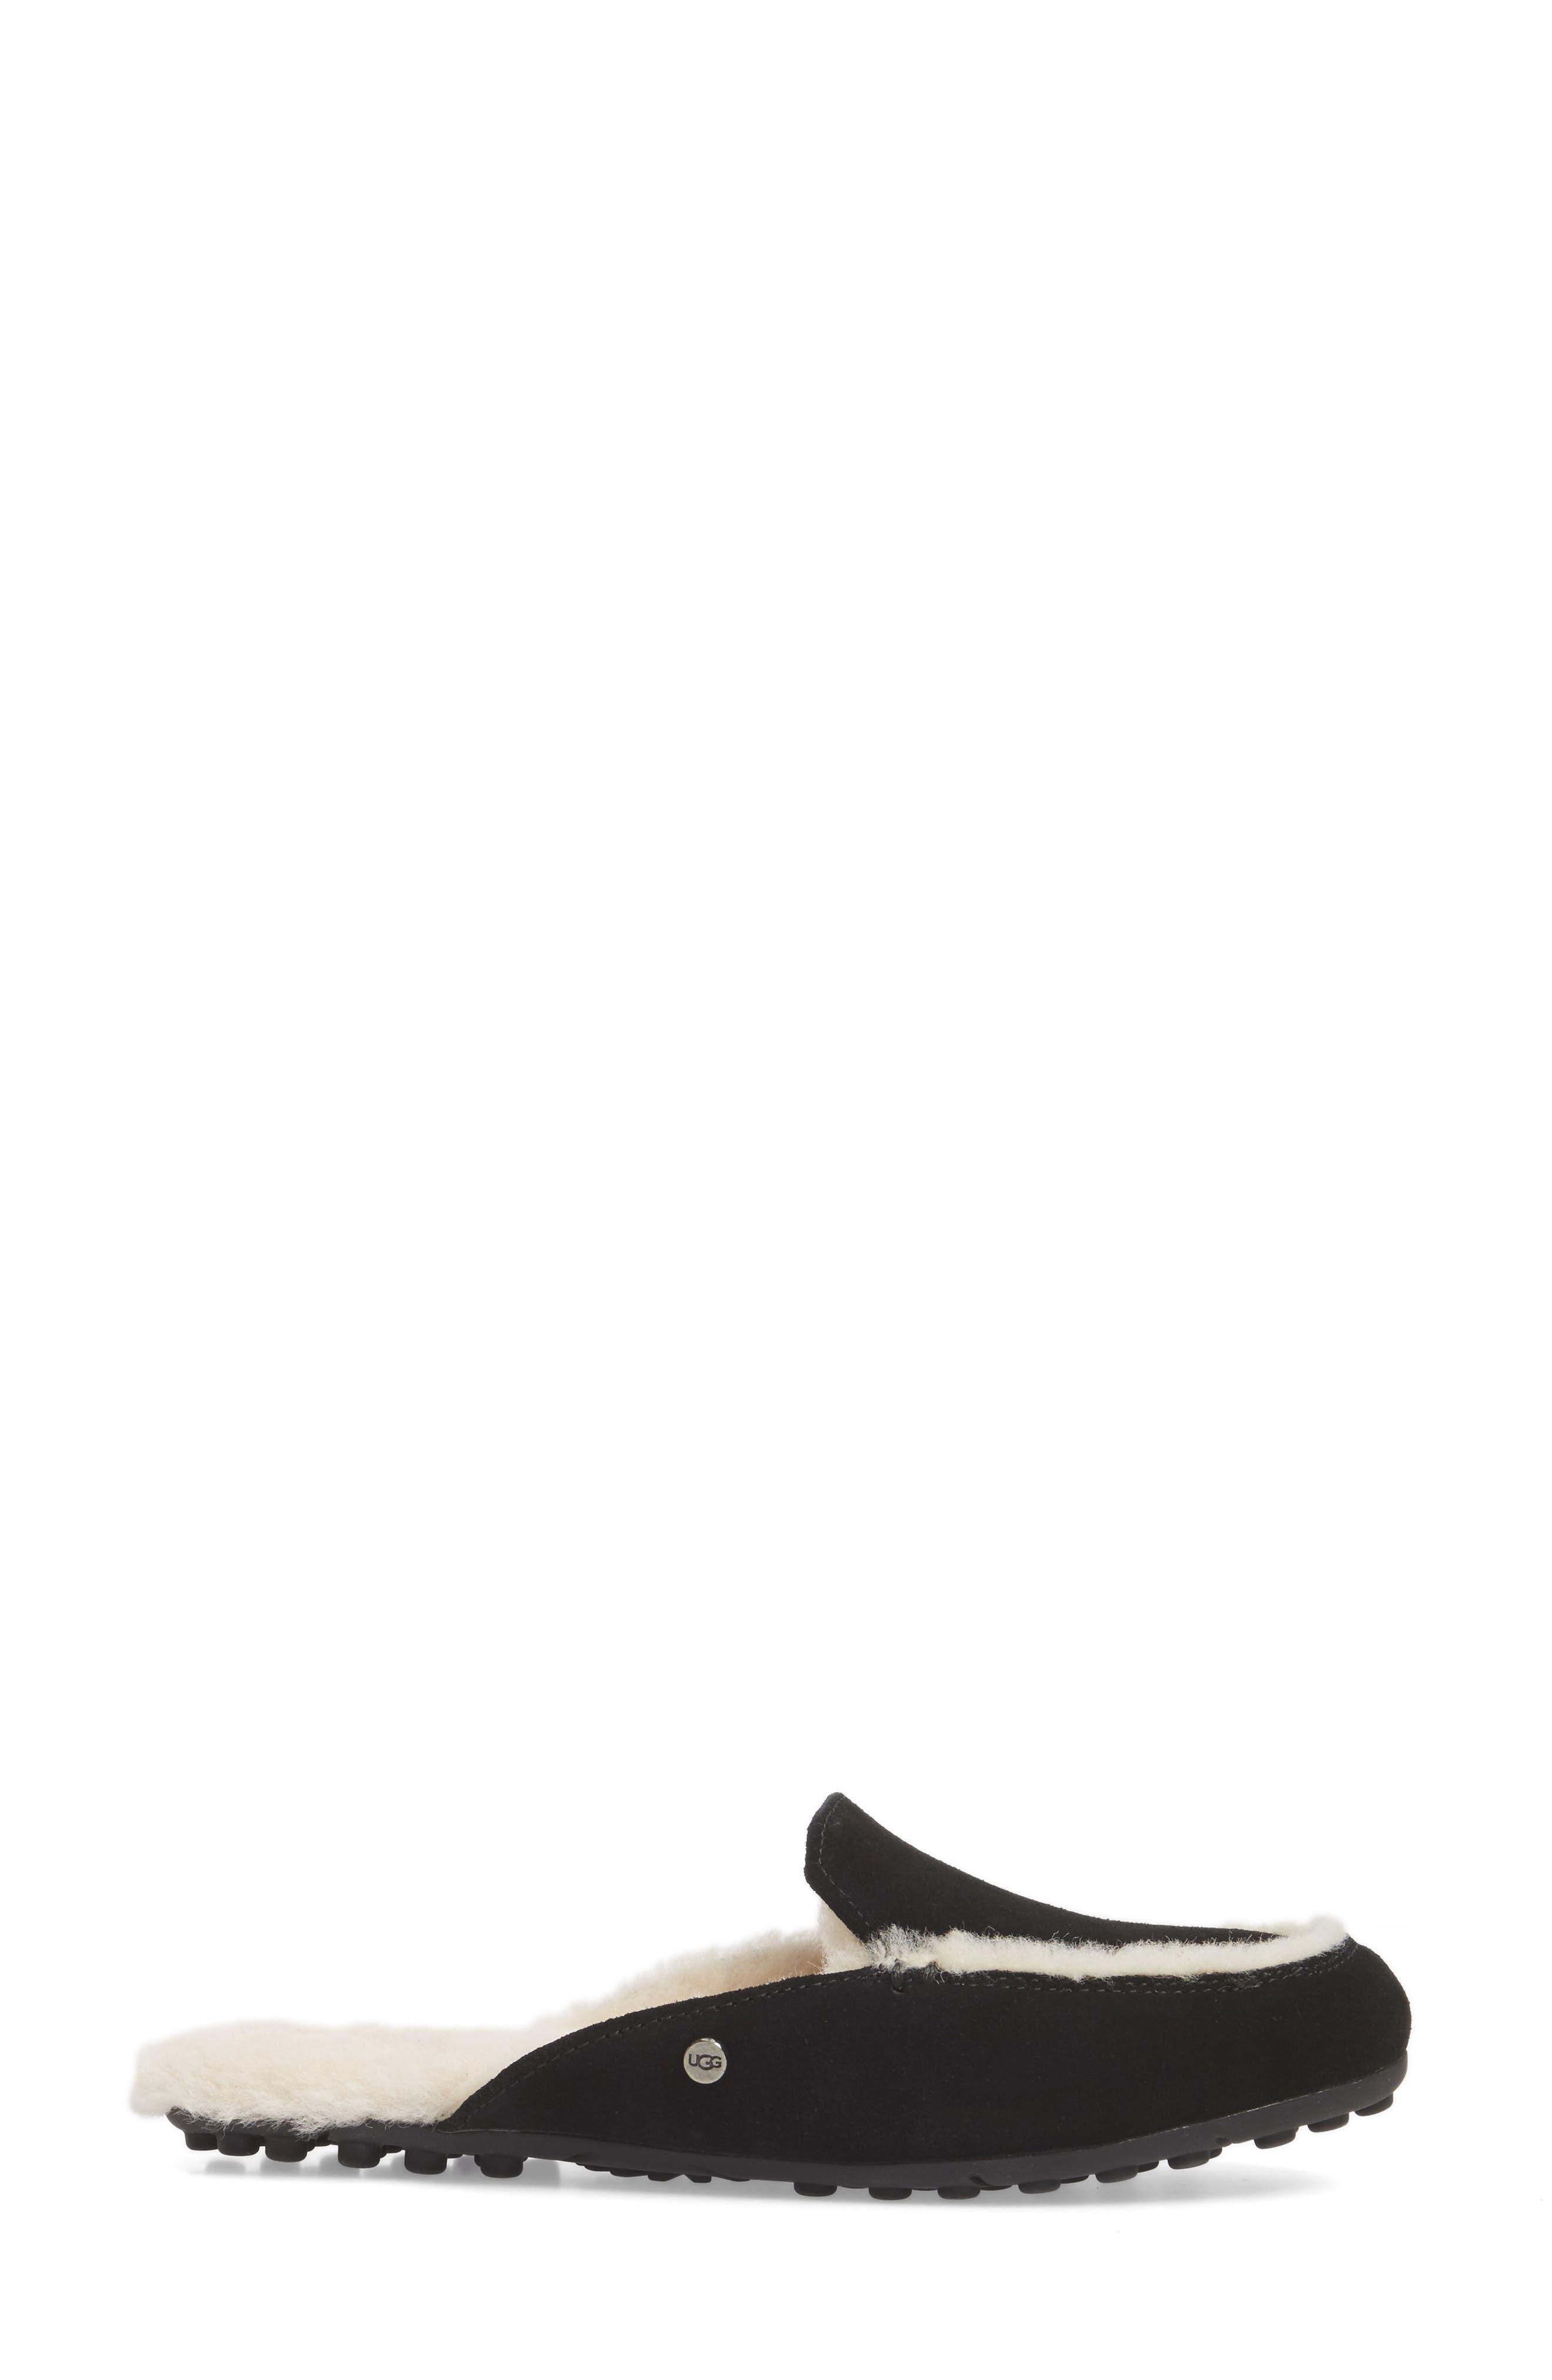 UGG<SUP>®</SUP>, Lane Genuine Shearling Slipper, Alternate thumbnail 3, color, BLACK SUEDE